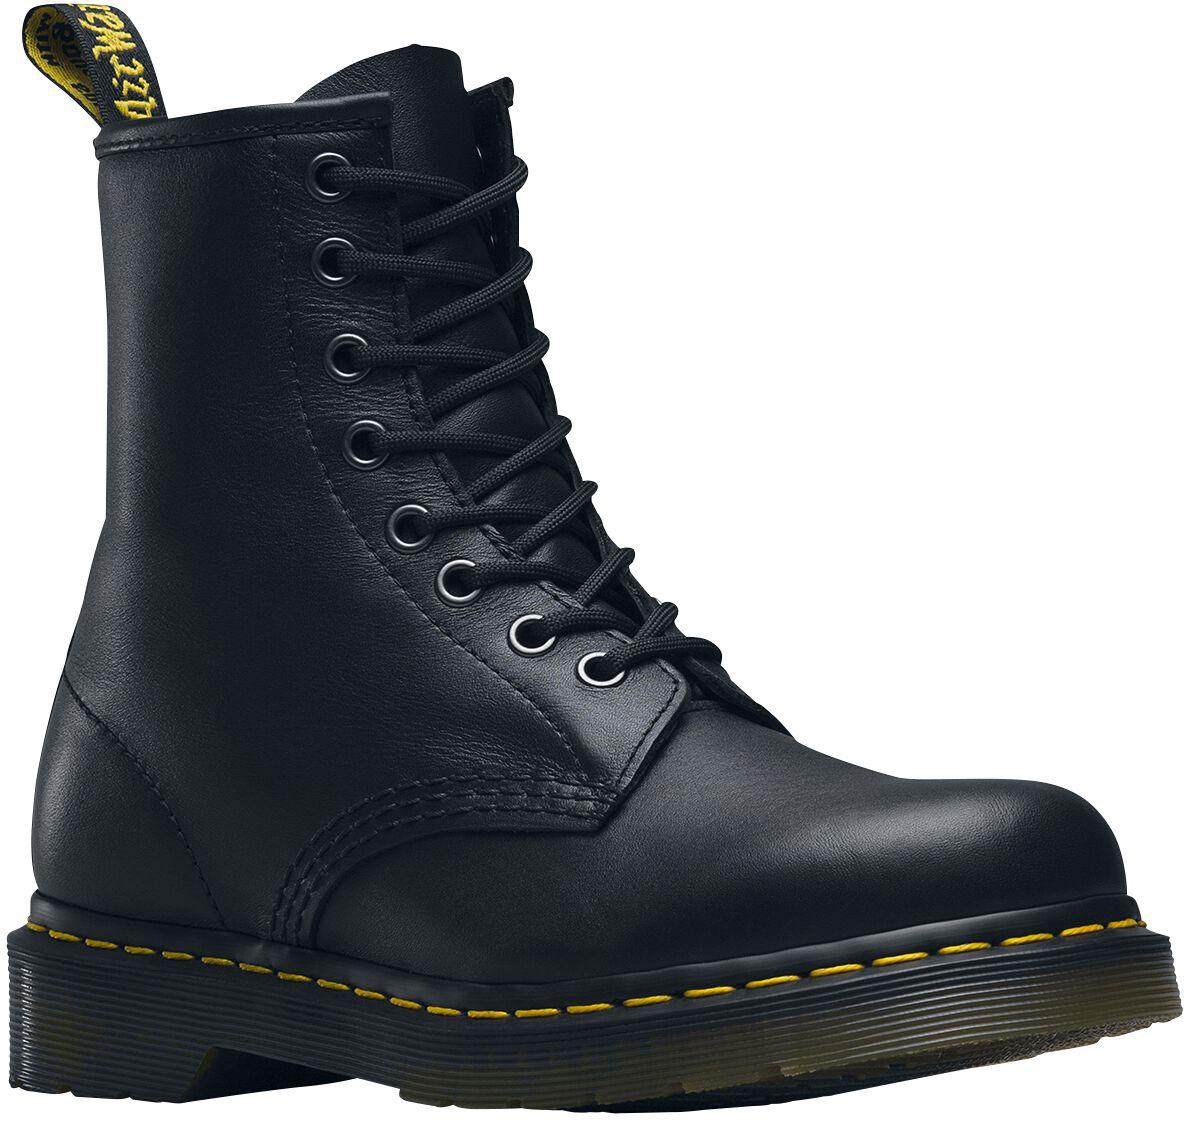 Fanprodukter Dr.Martens 1460 DMC Nappa Støvler svart